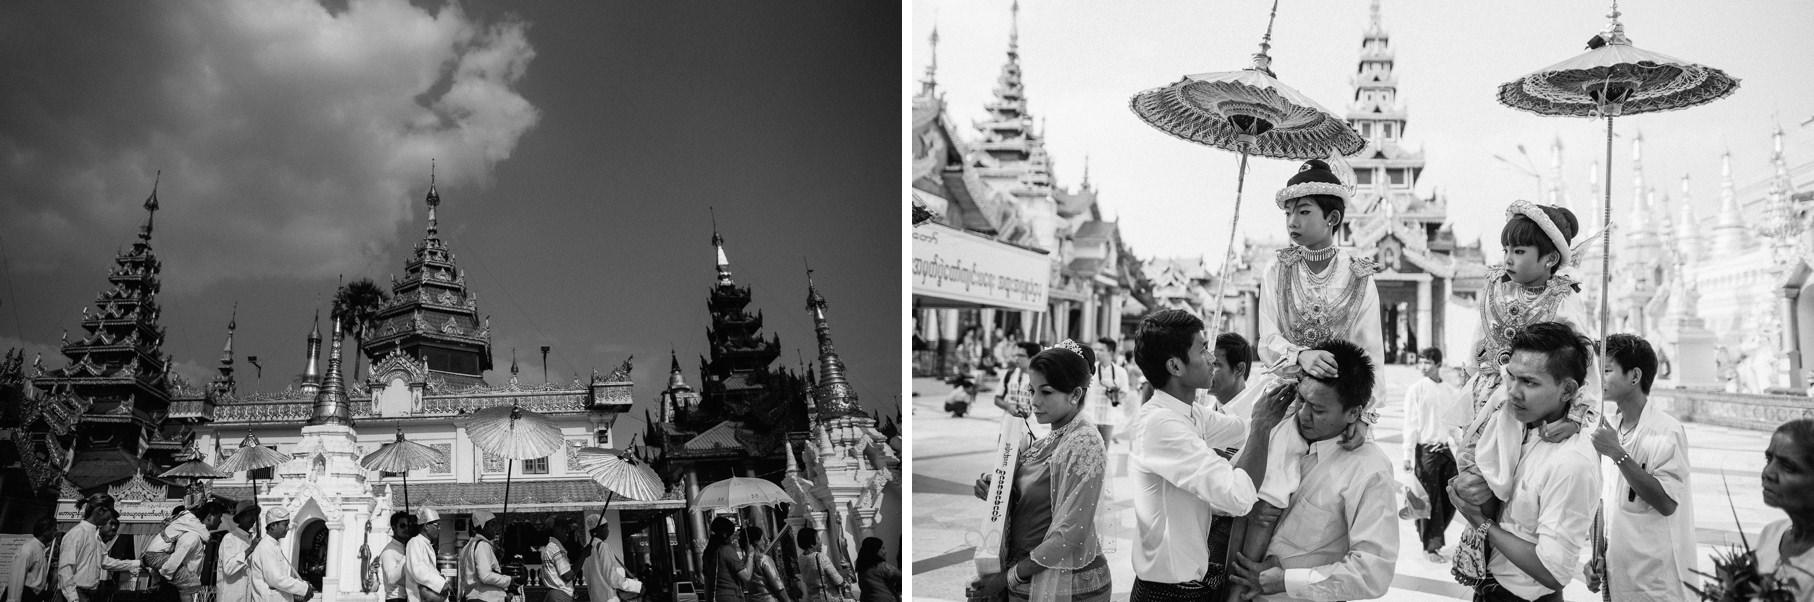 0015 yangon mandalay d76 4398 - Großstädte Myanmars - Yangon & Mandalay